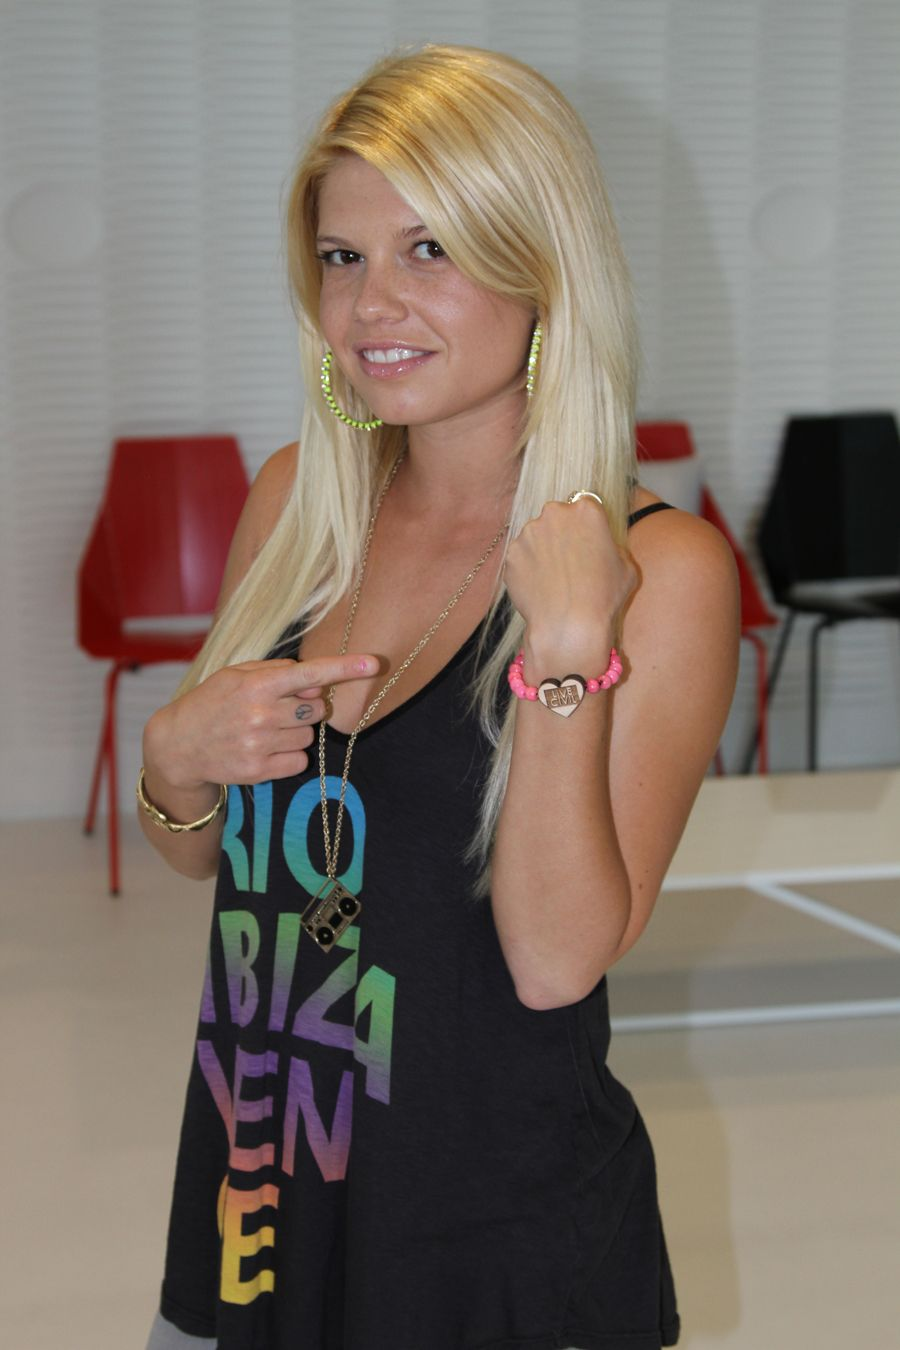 Chanel fantasy factory girl